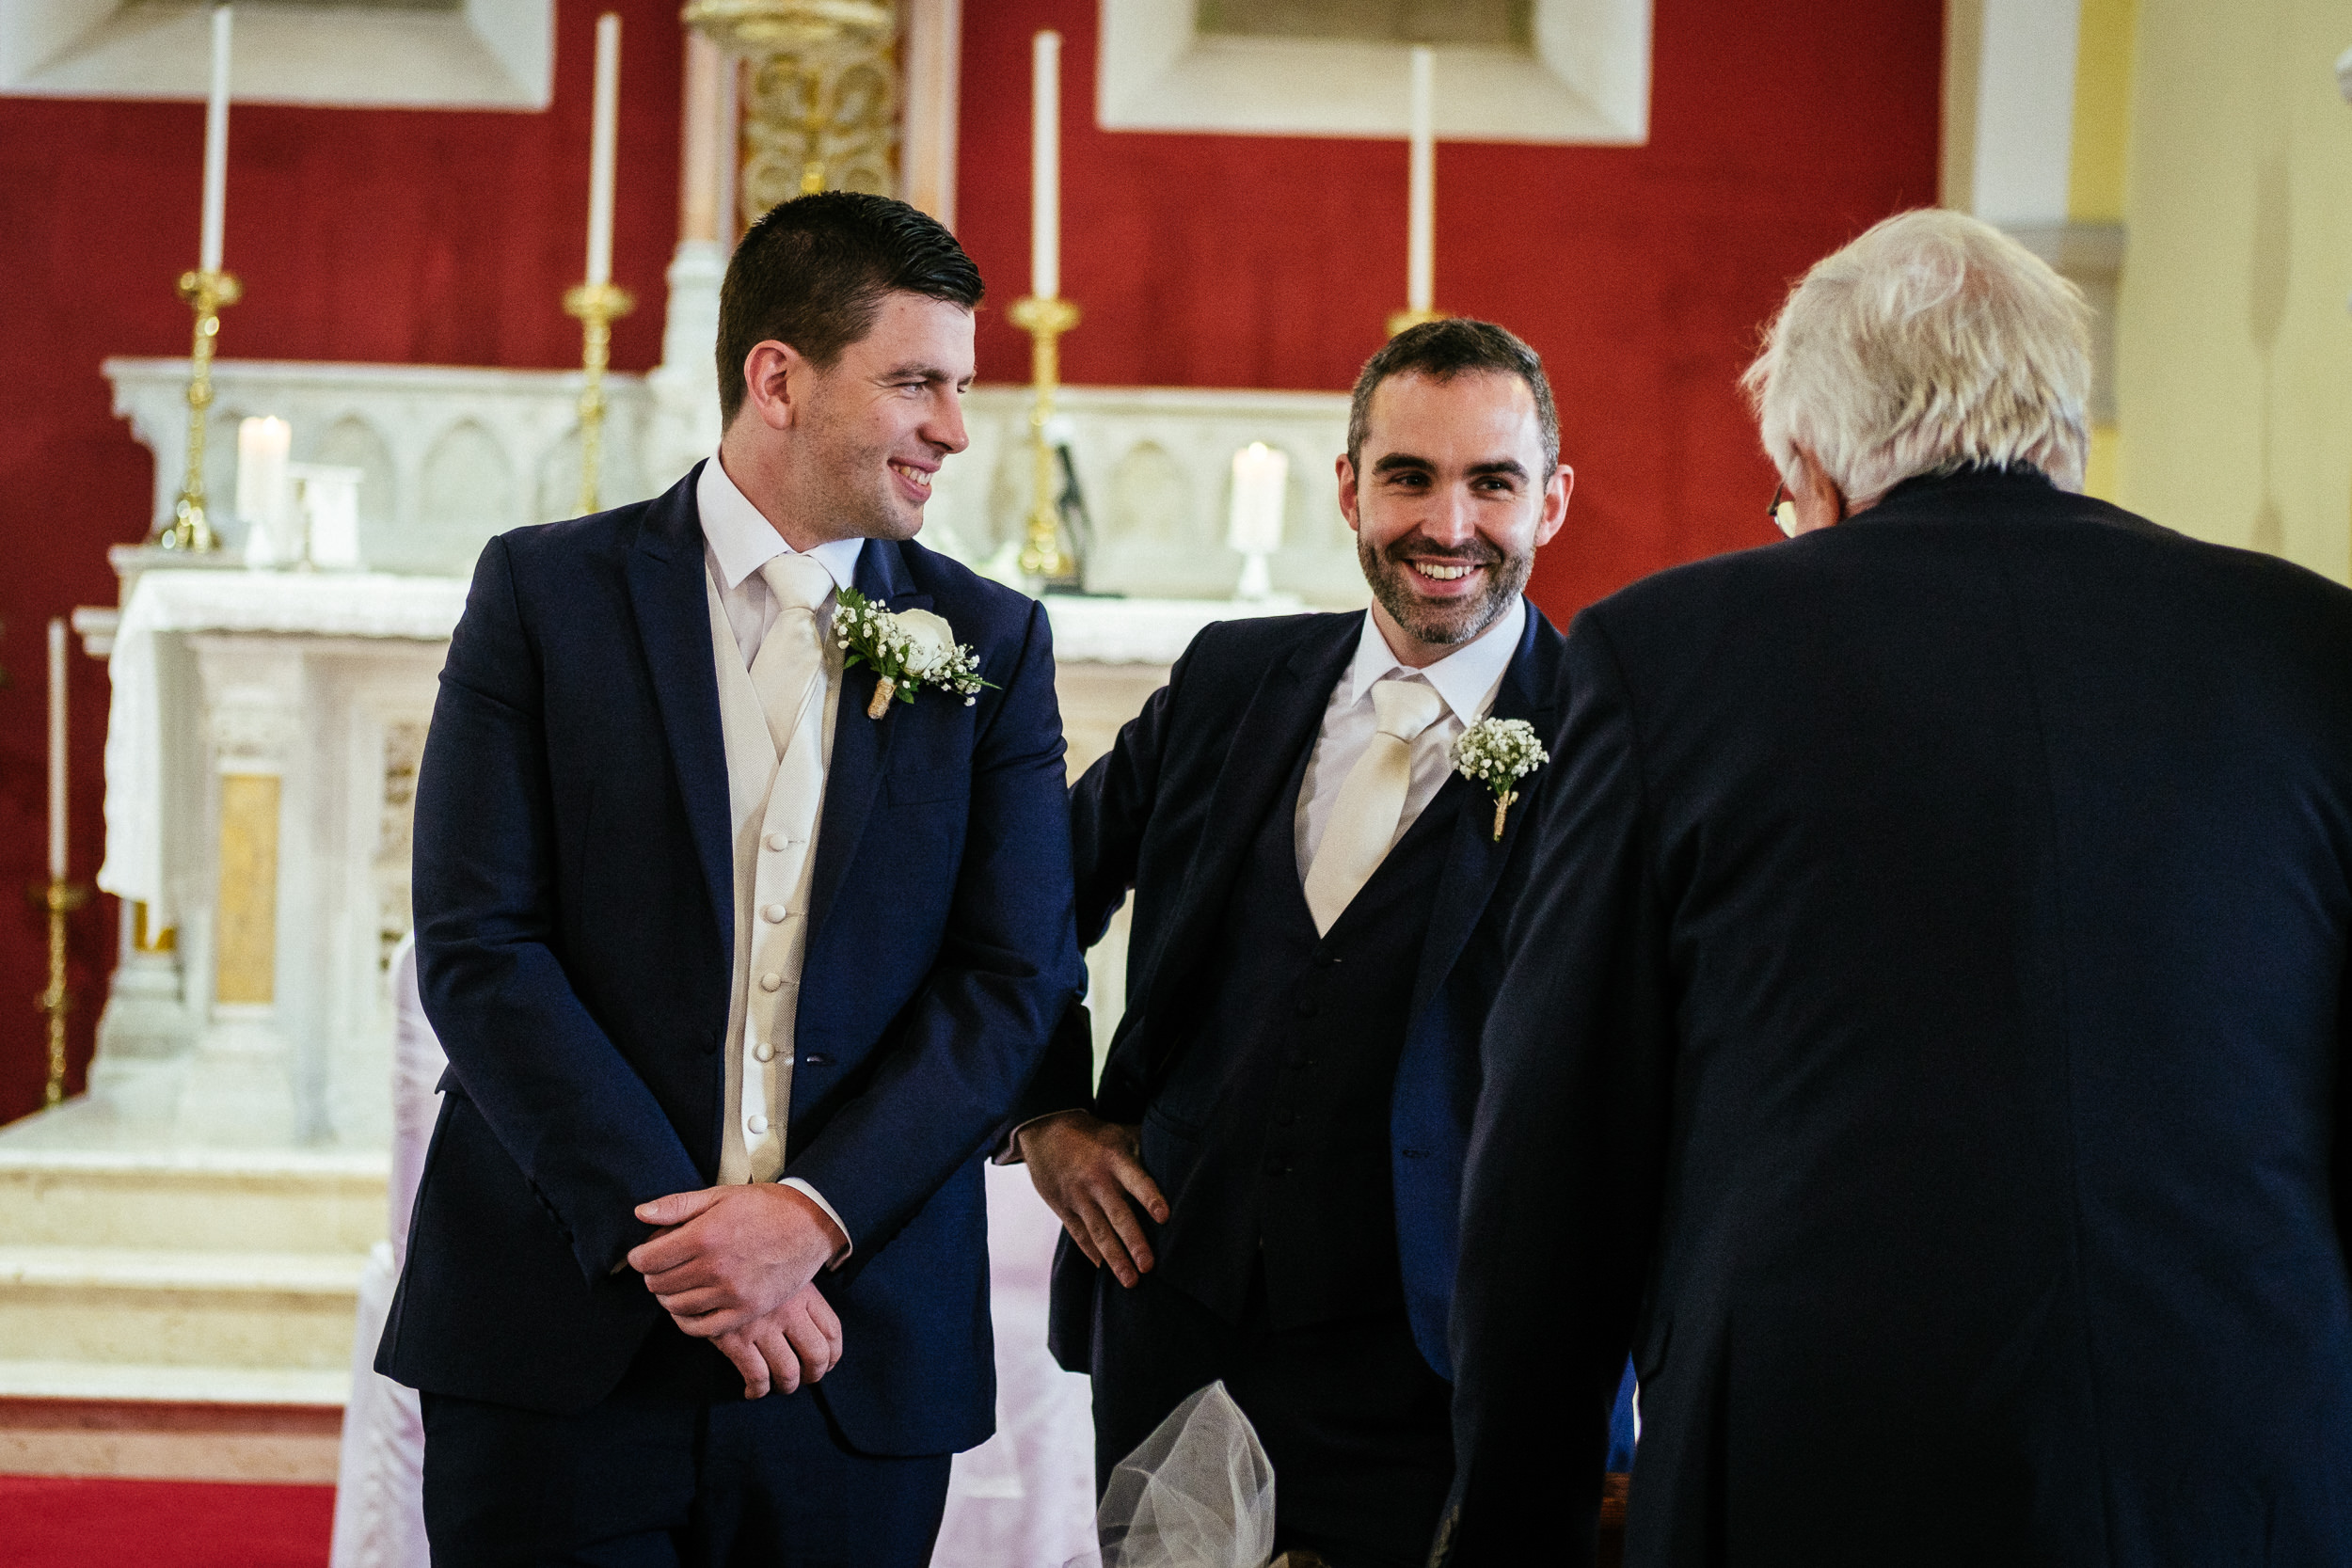 Dunmore House Hotel Clonakilty Cork Wedding Photographer 1 2